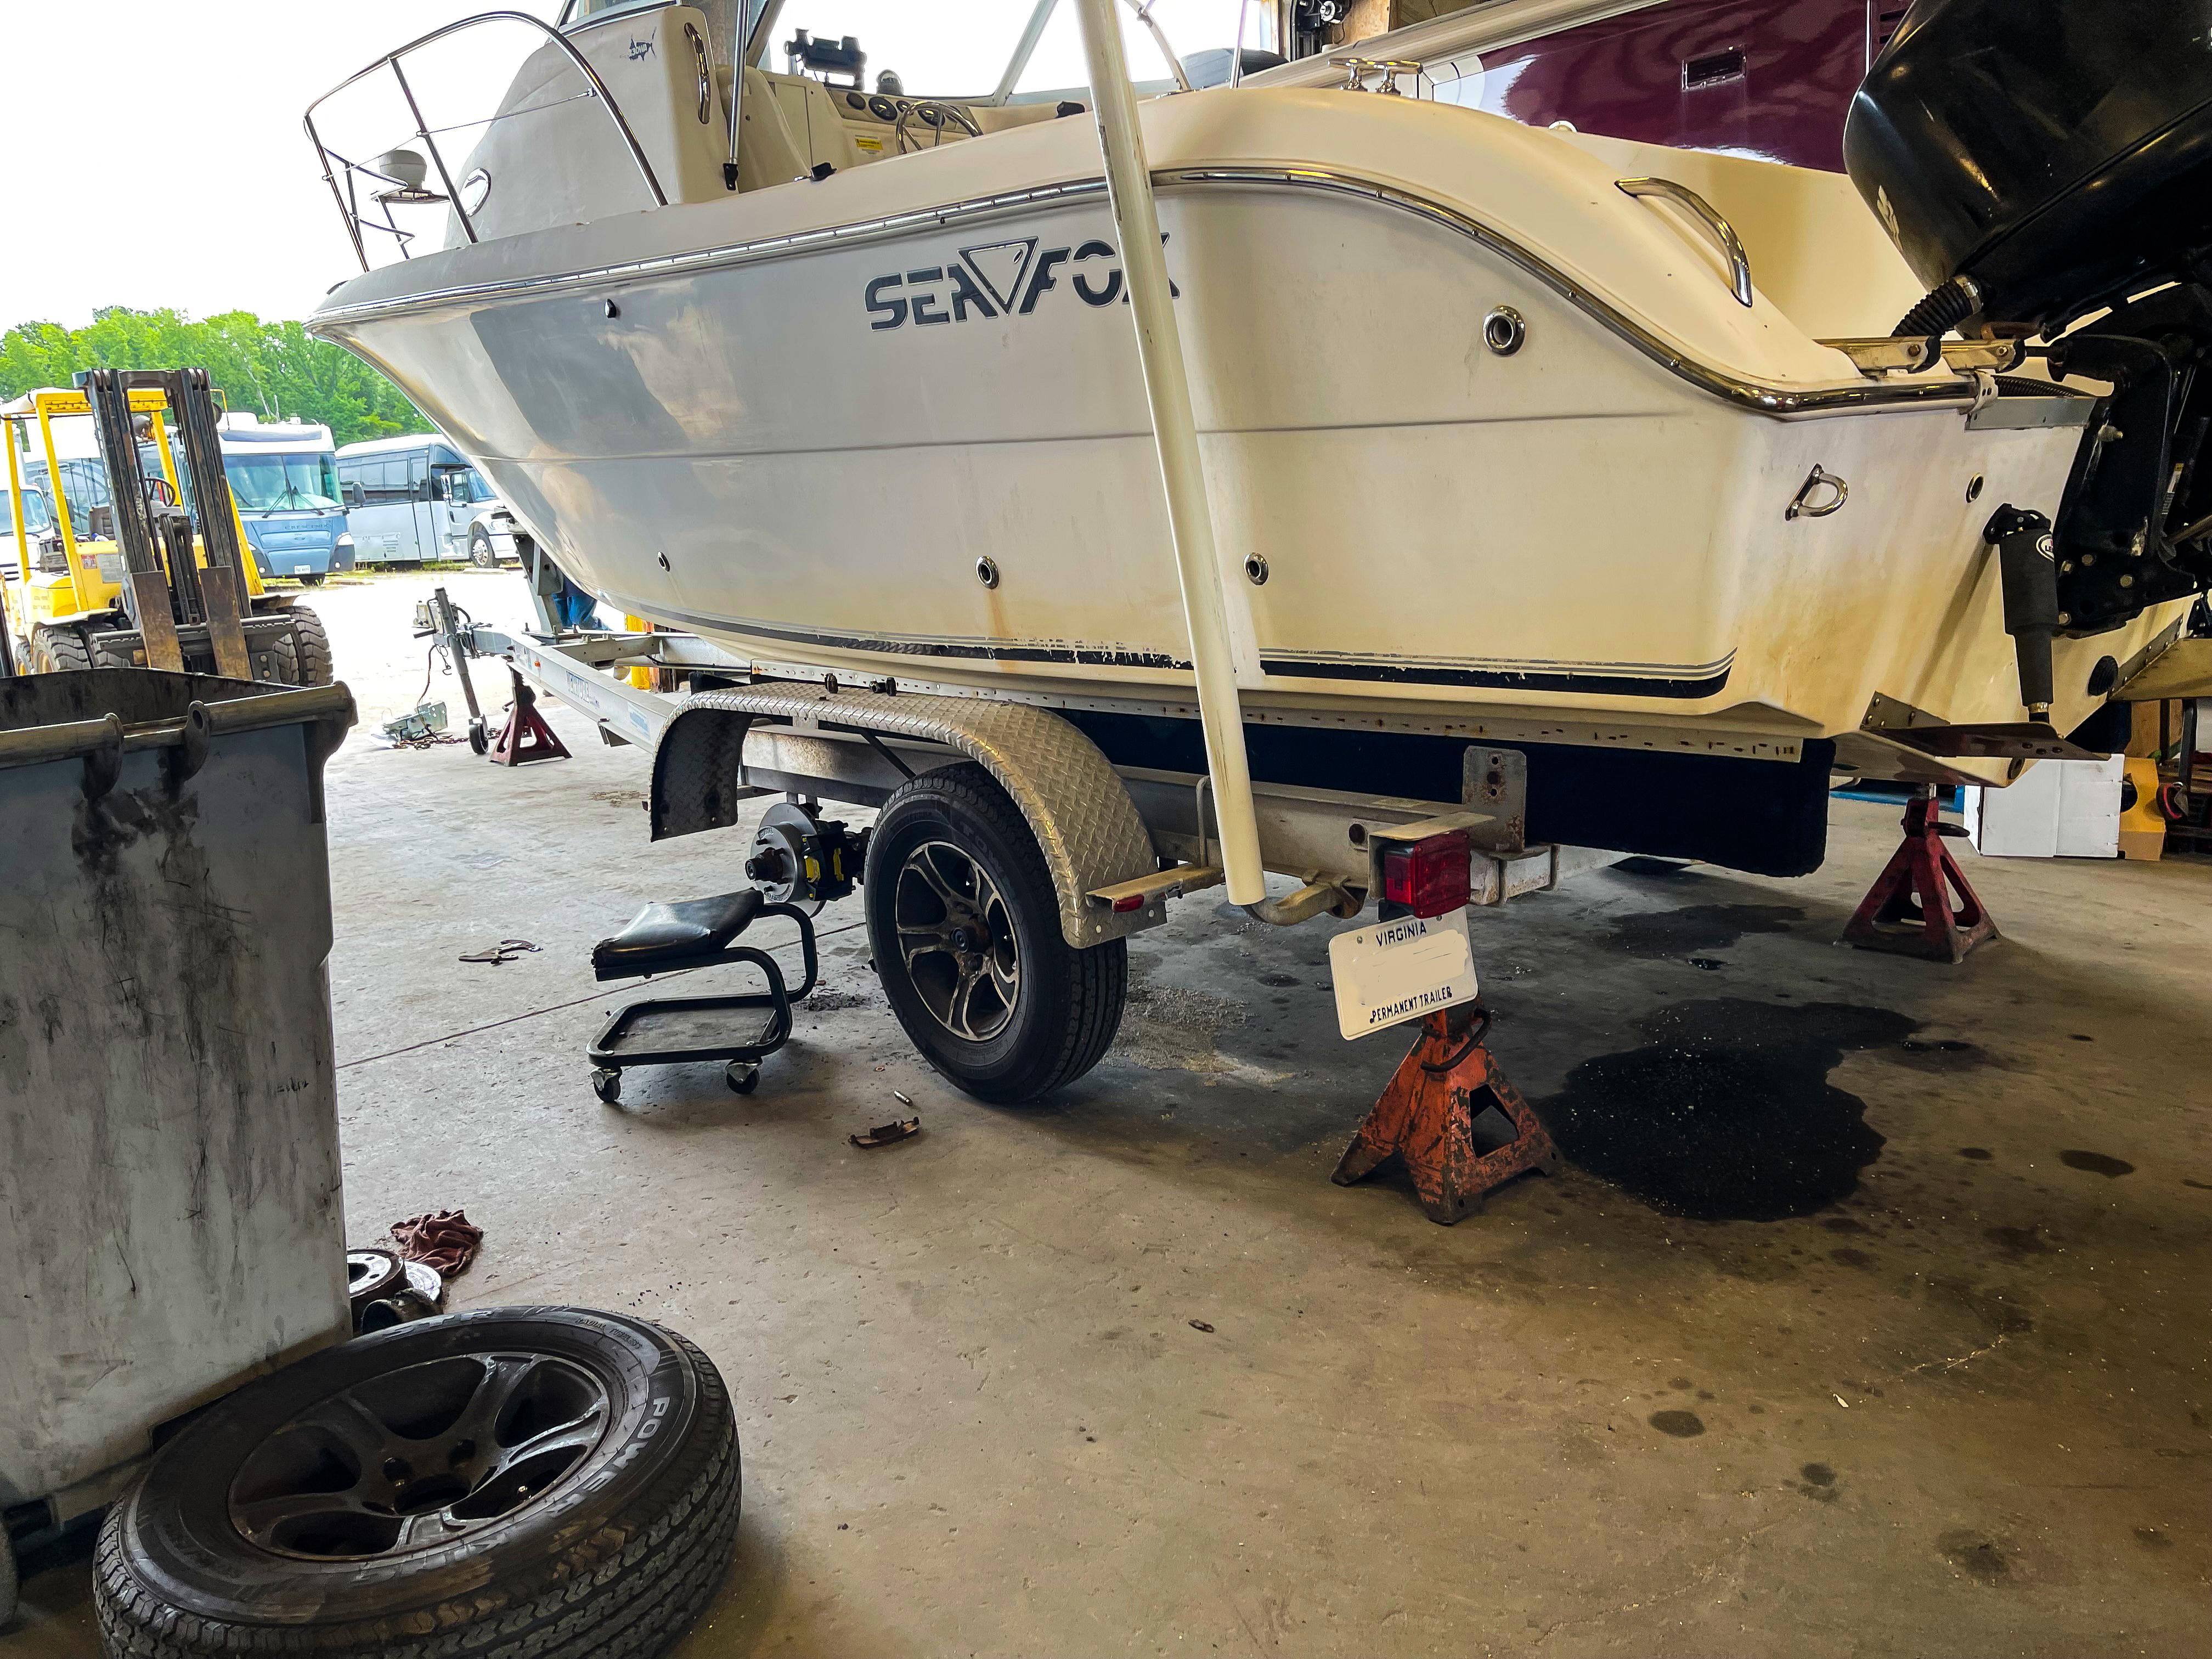 Service Description for Tire Repair Image